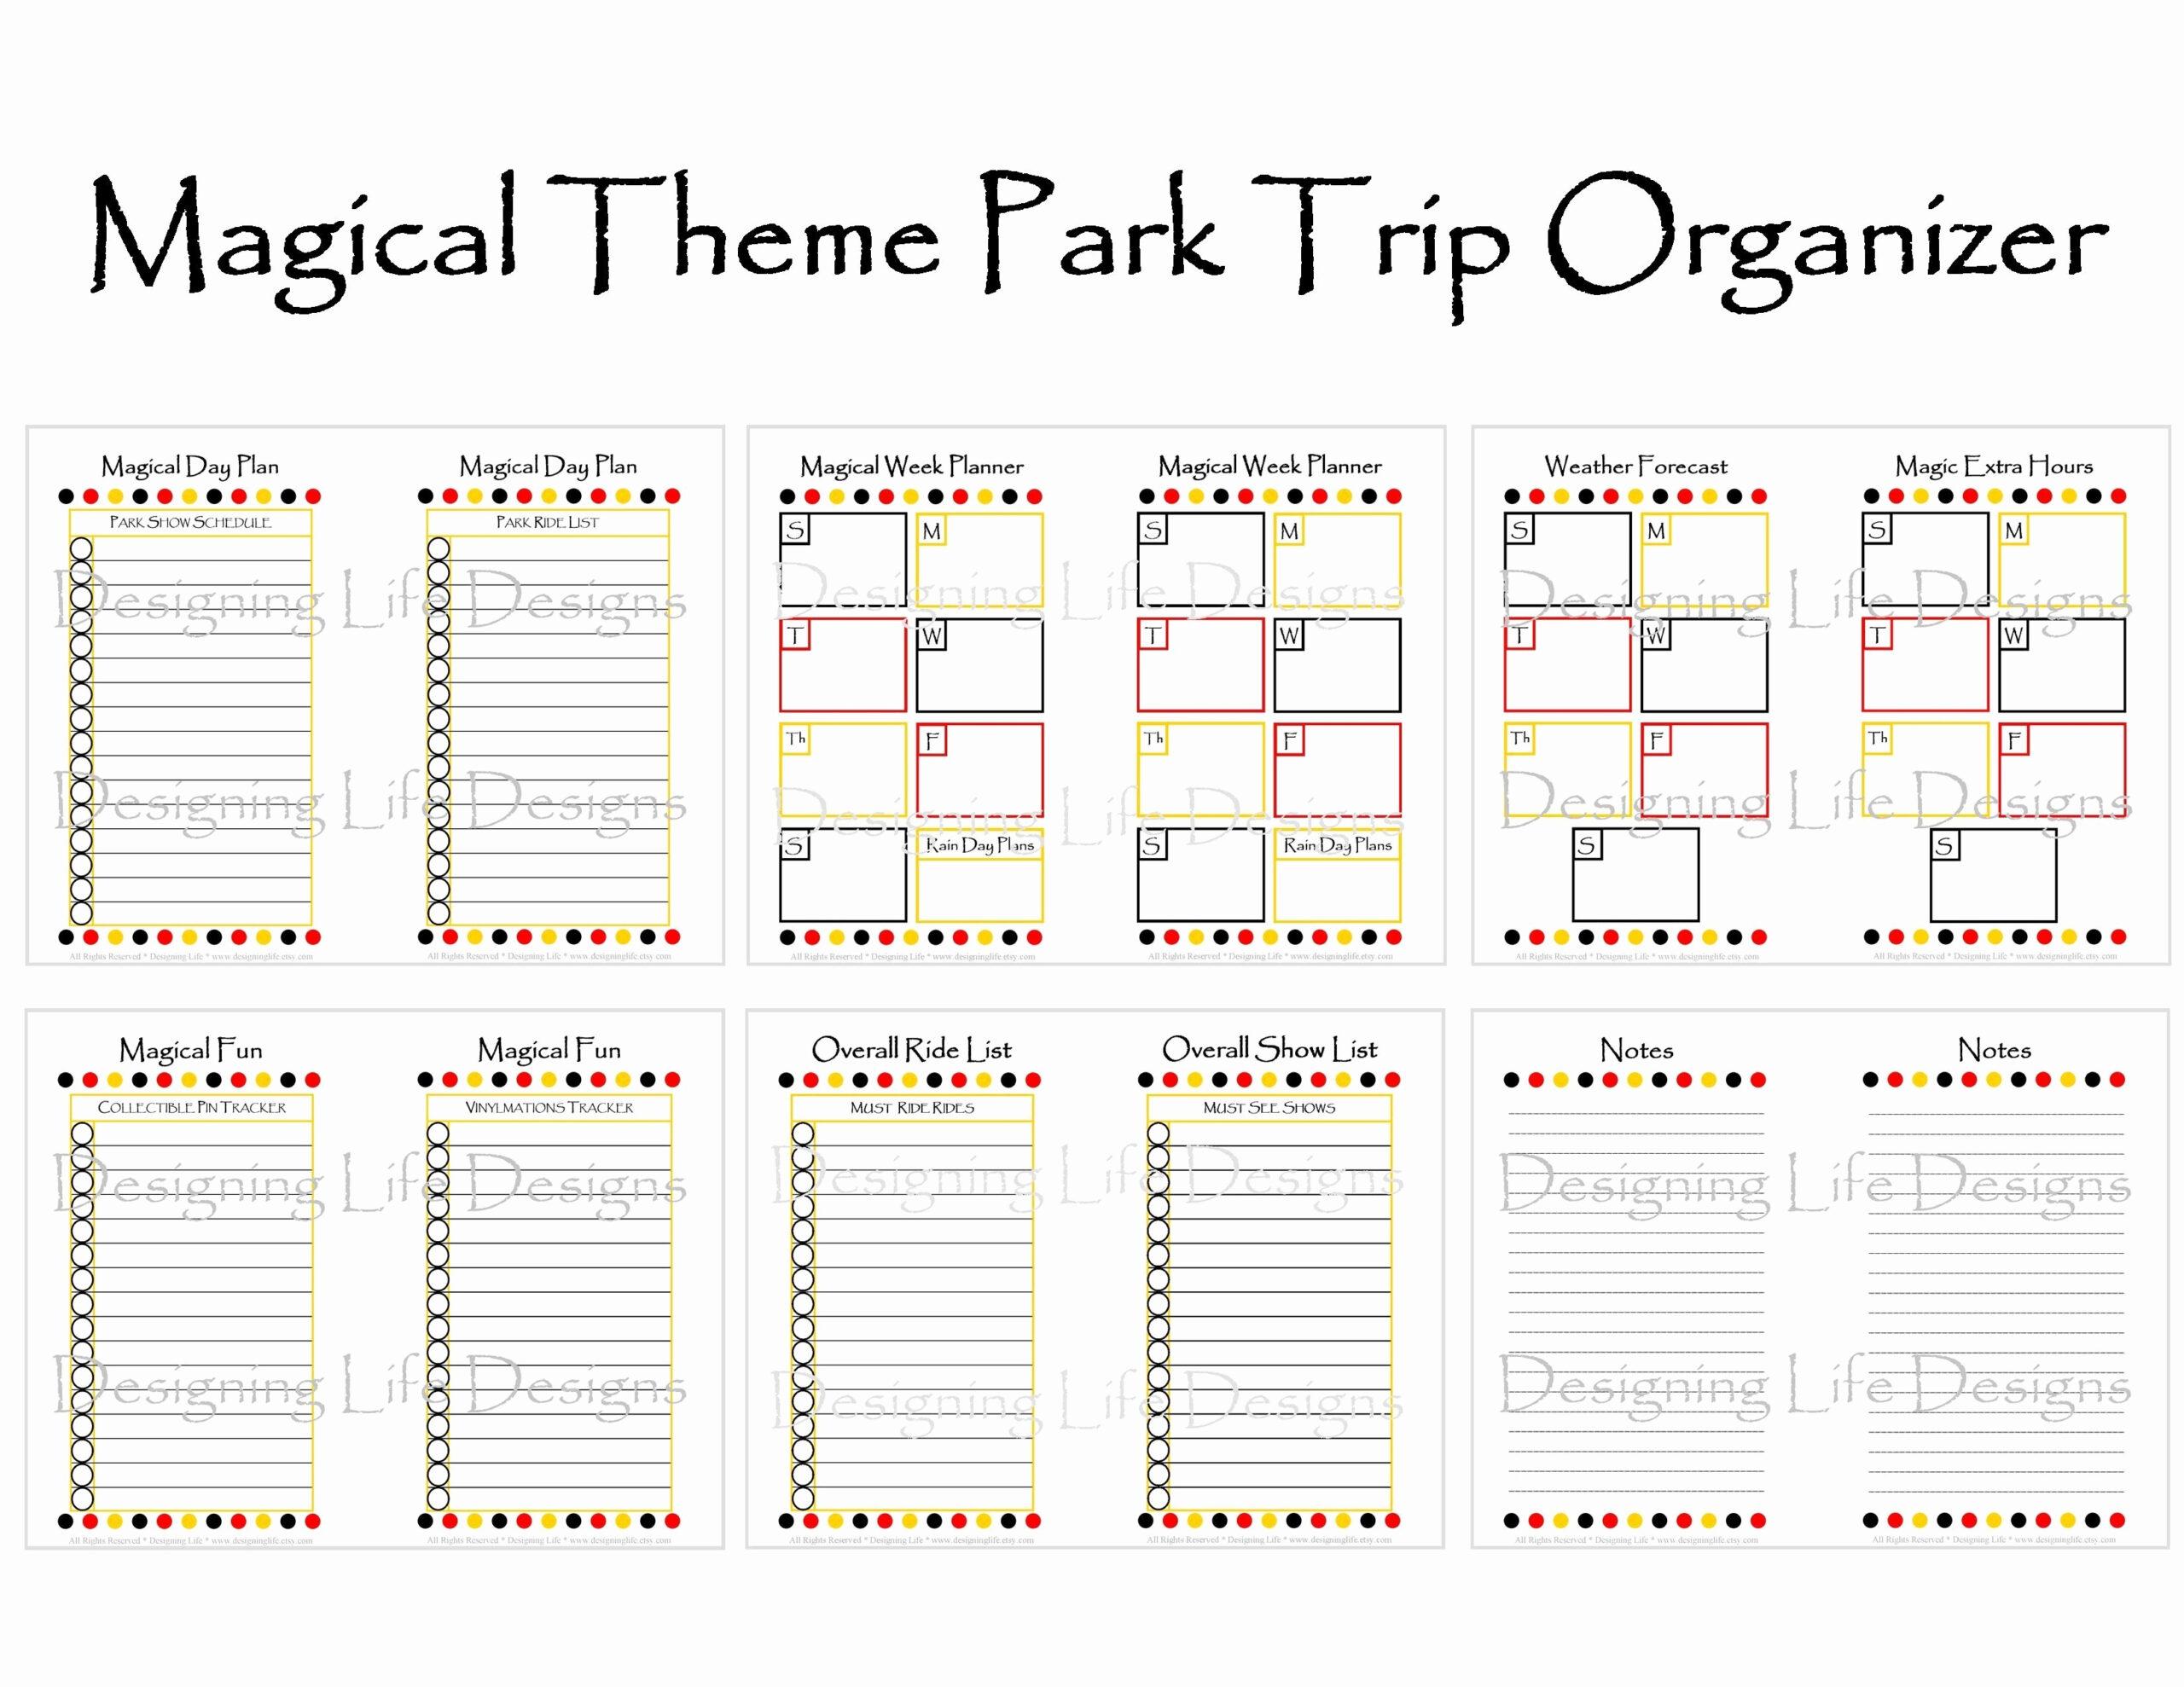 Disney World Blank Itinerary Template | Example Calendar pertaining to Disneyland Itinerary Template